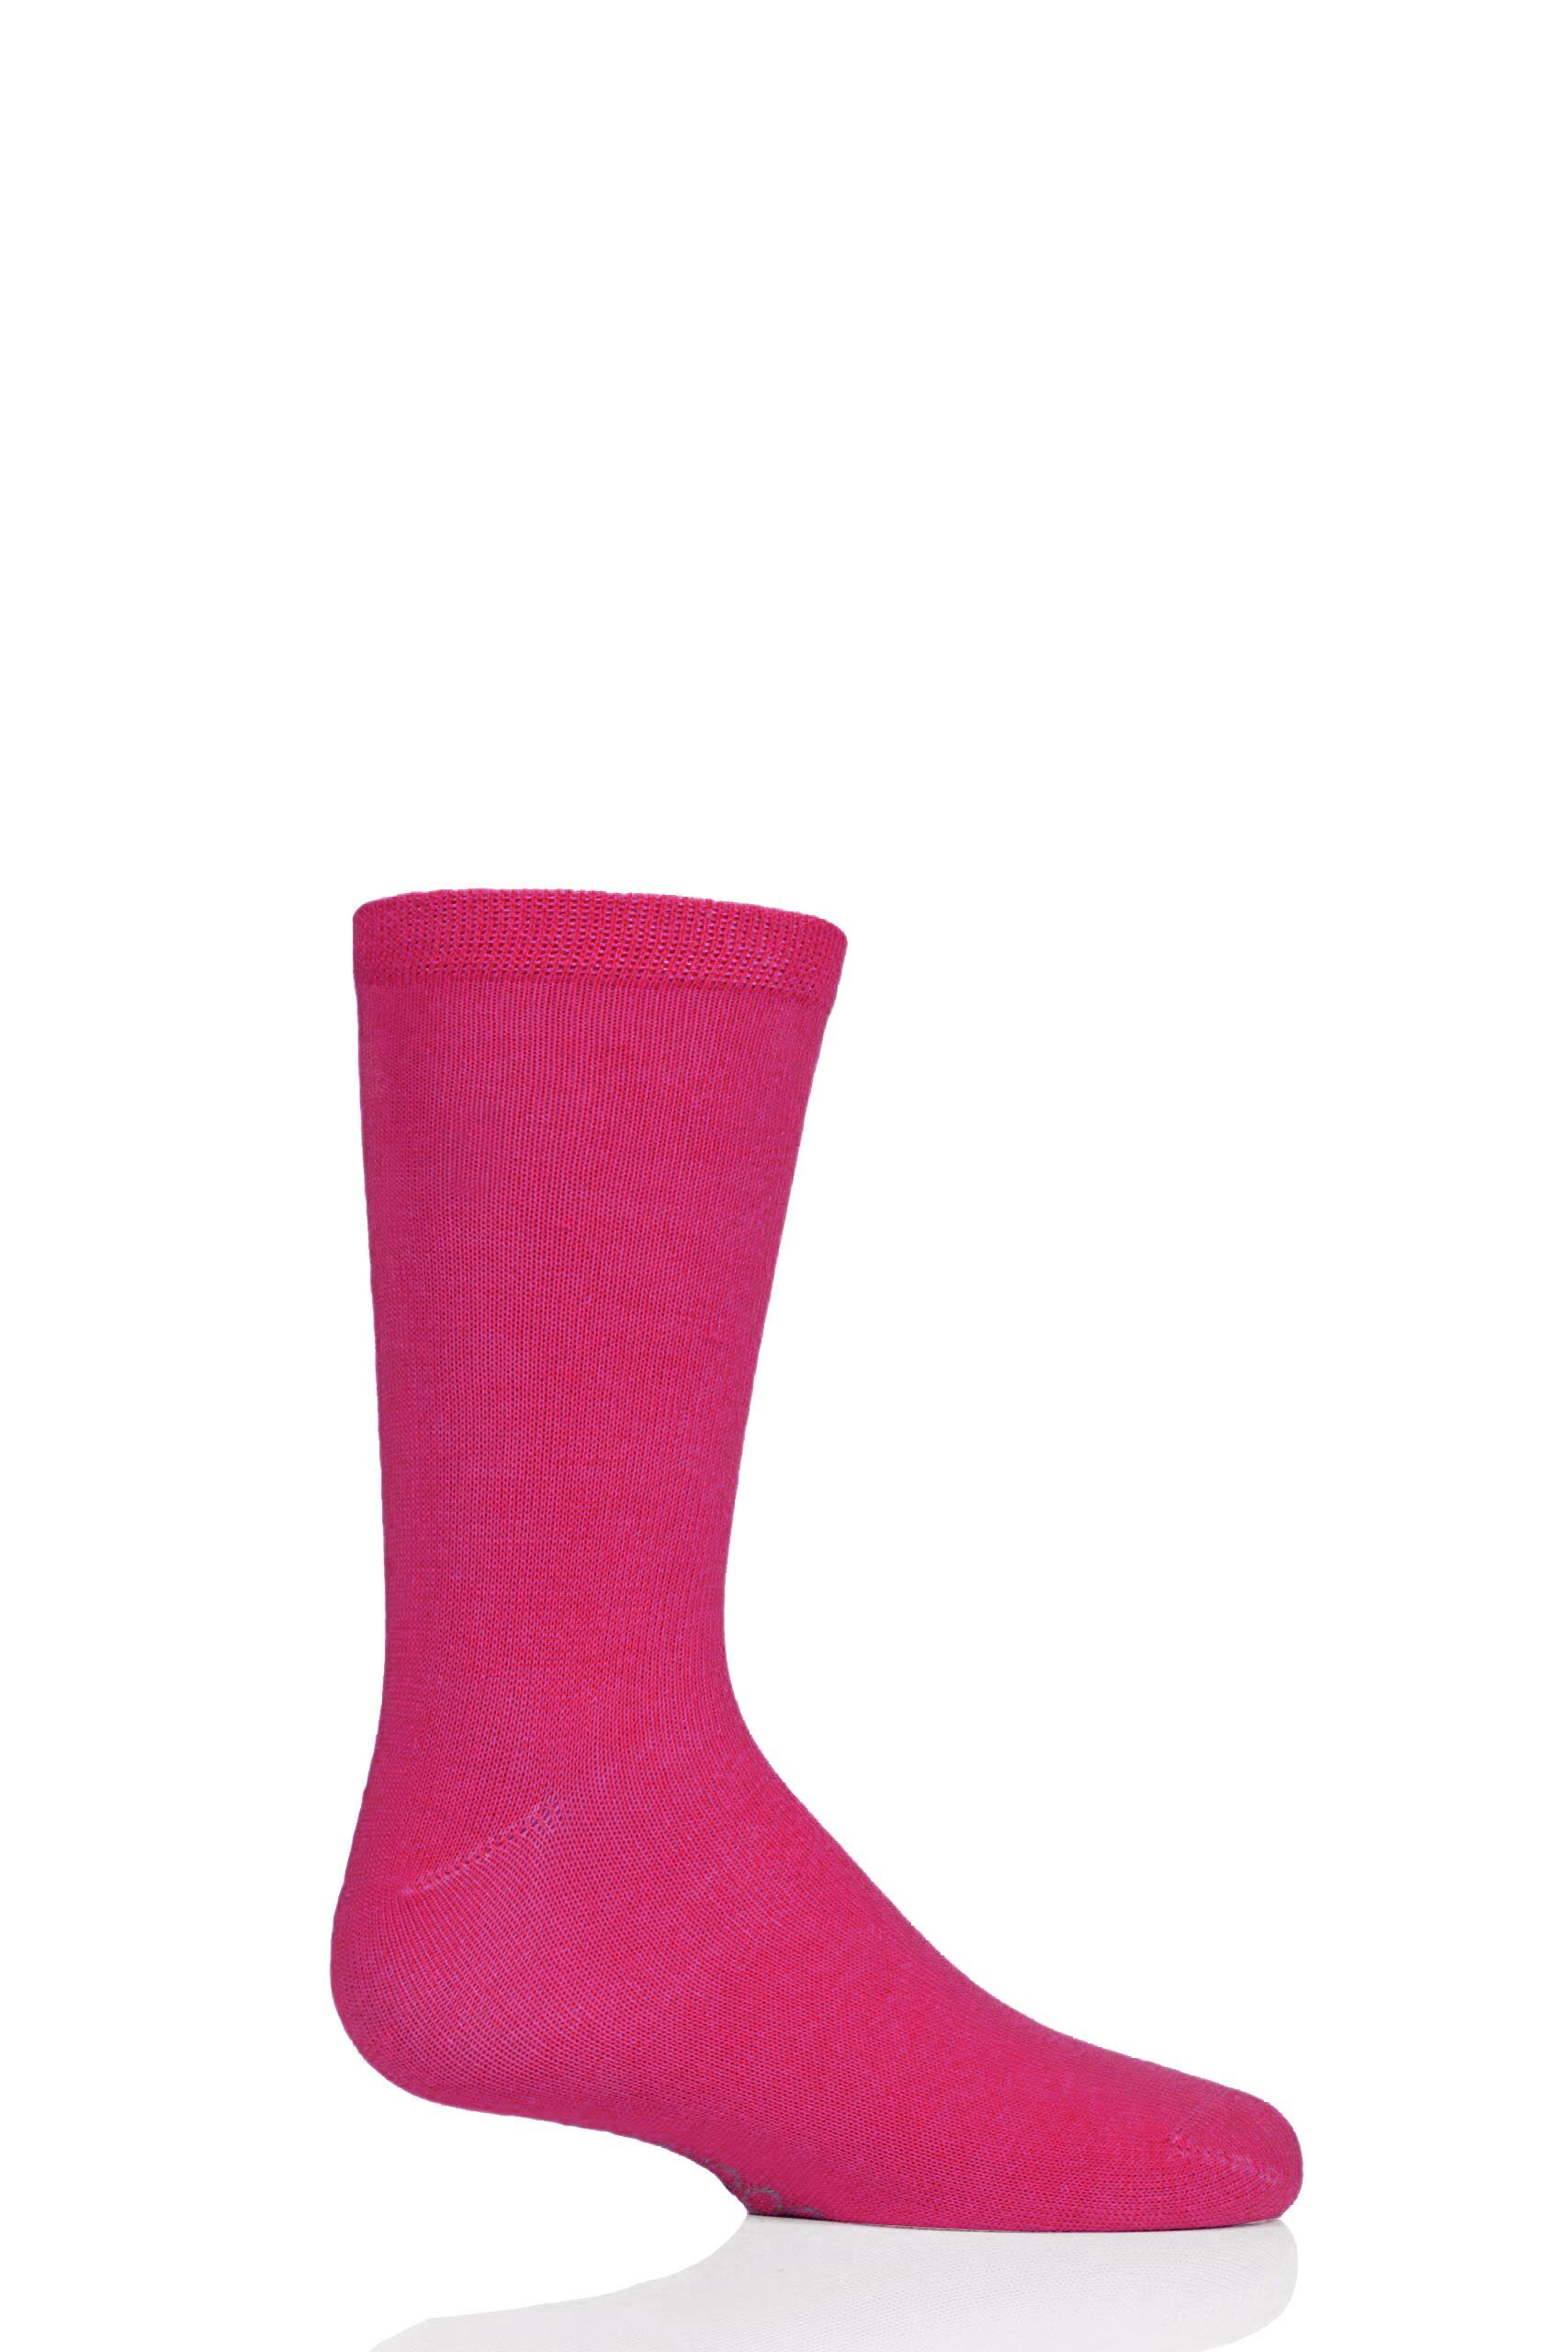 Image of 1 Pair Dark Pink Plain Bamboo Socks with Comfort Cuff and Smooth Toe Seams Kids Unisex 12.5-3.5 Kids (8-12 Years) - SOCKSHOP